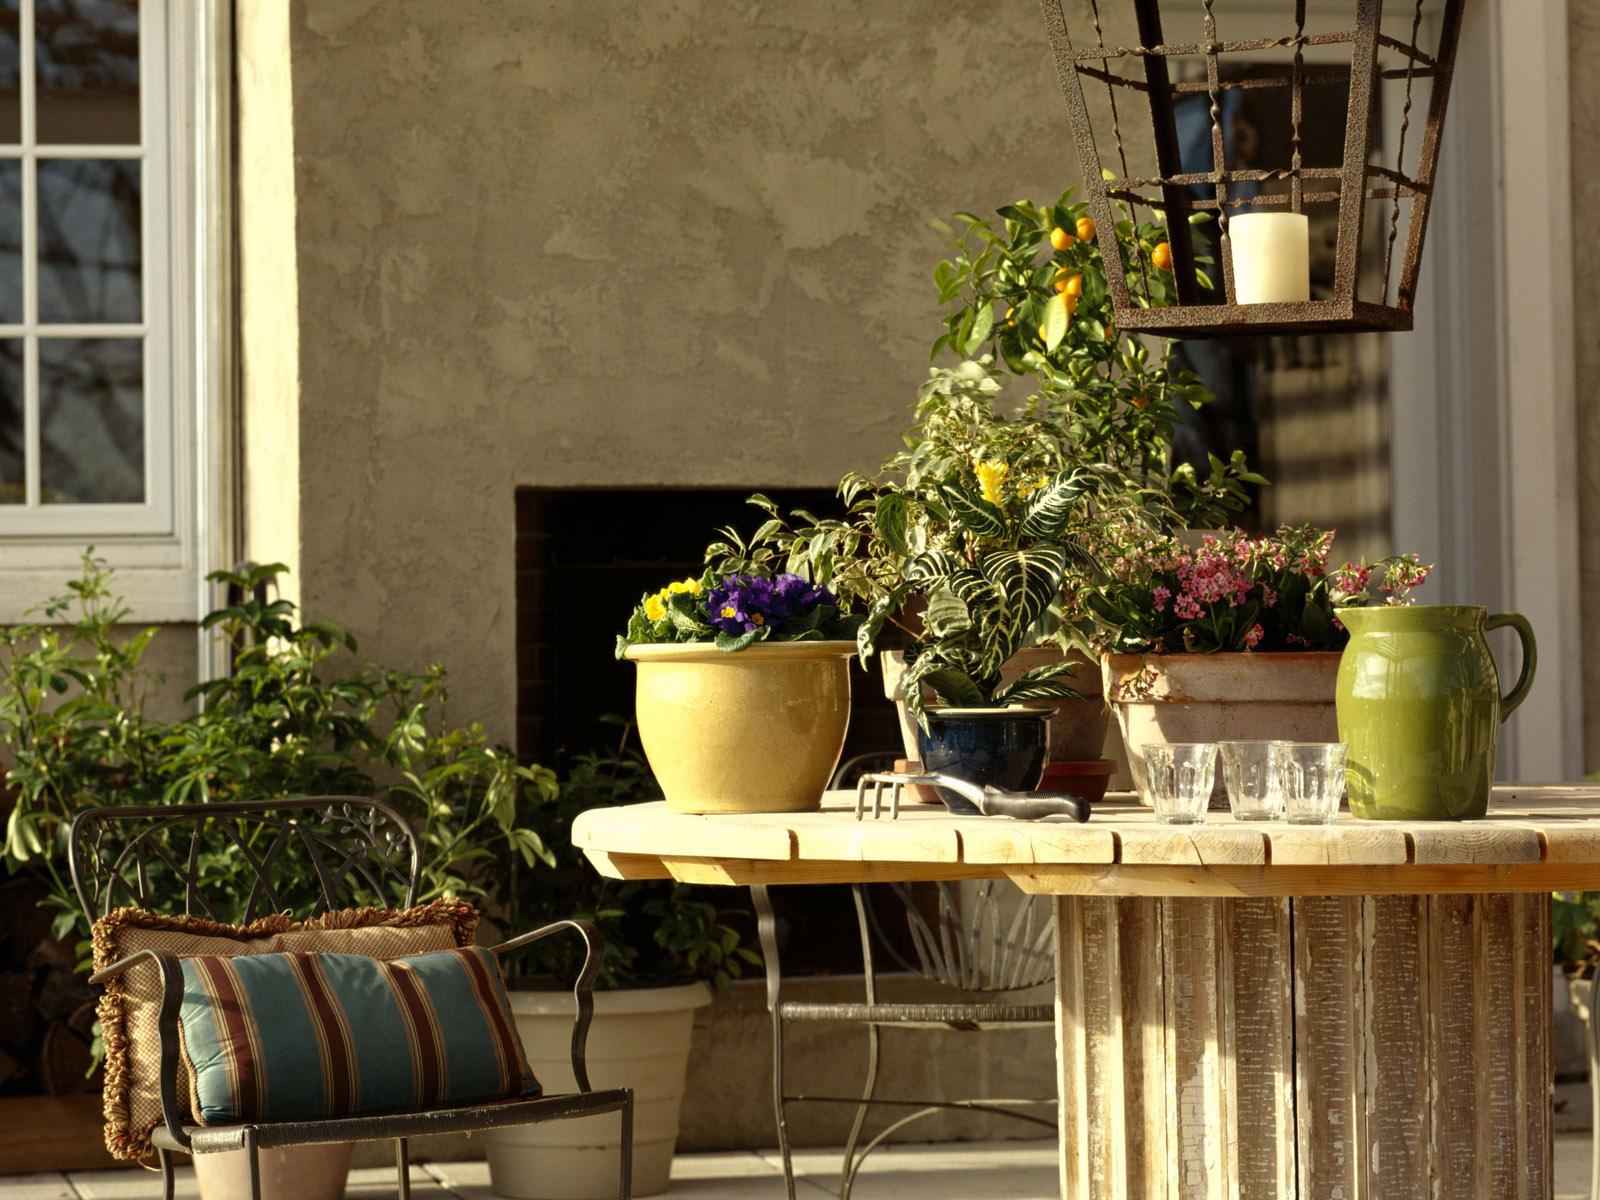 Wallpapers Amazing Home Interior Design 80 Hd Wallpapers For Desktop Free Download 2013 Set 1